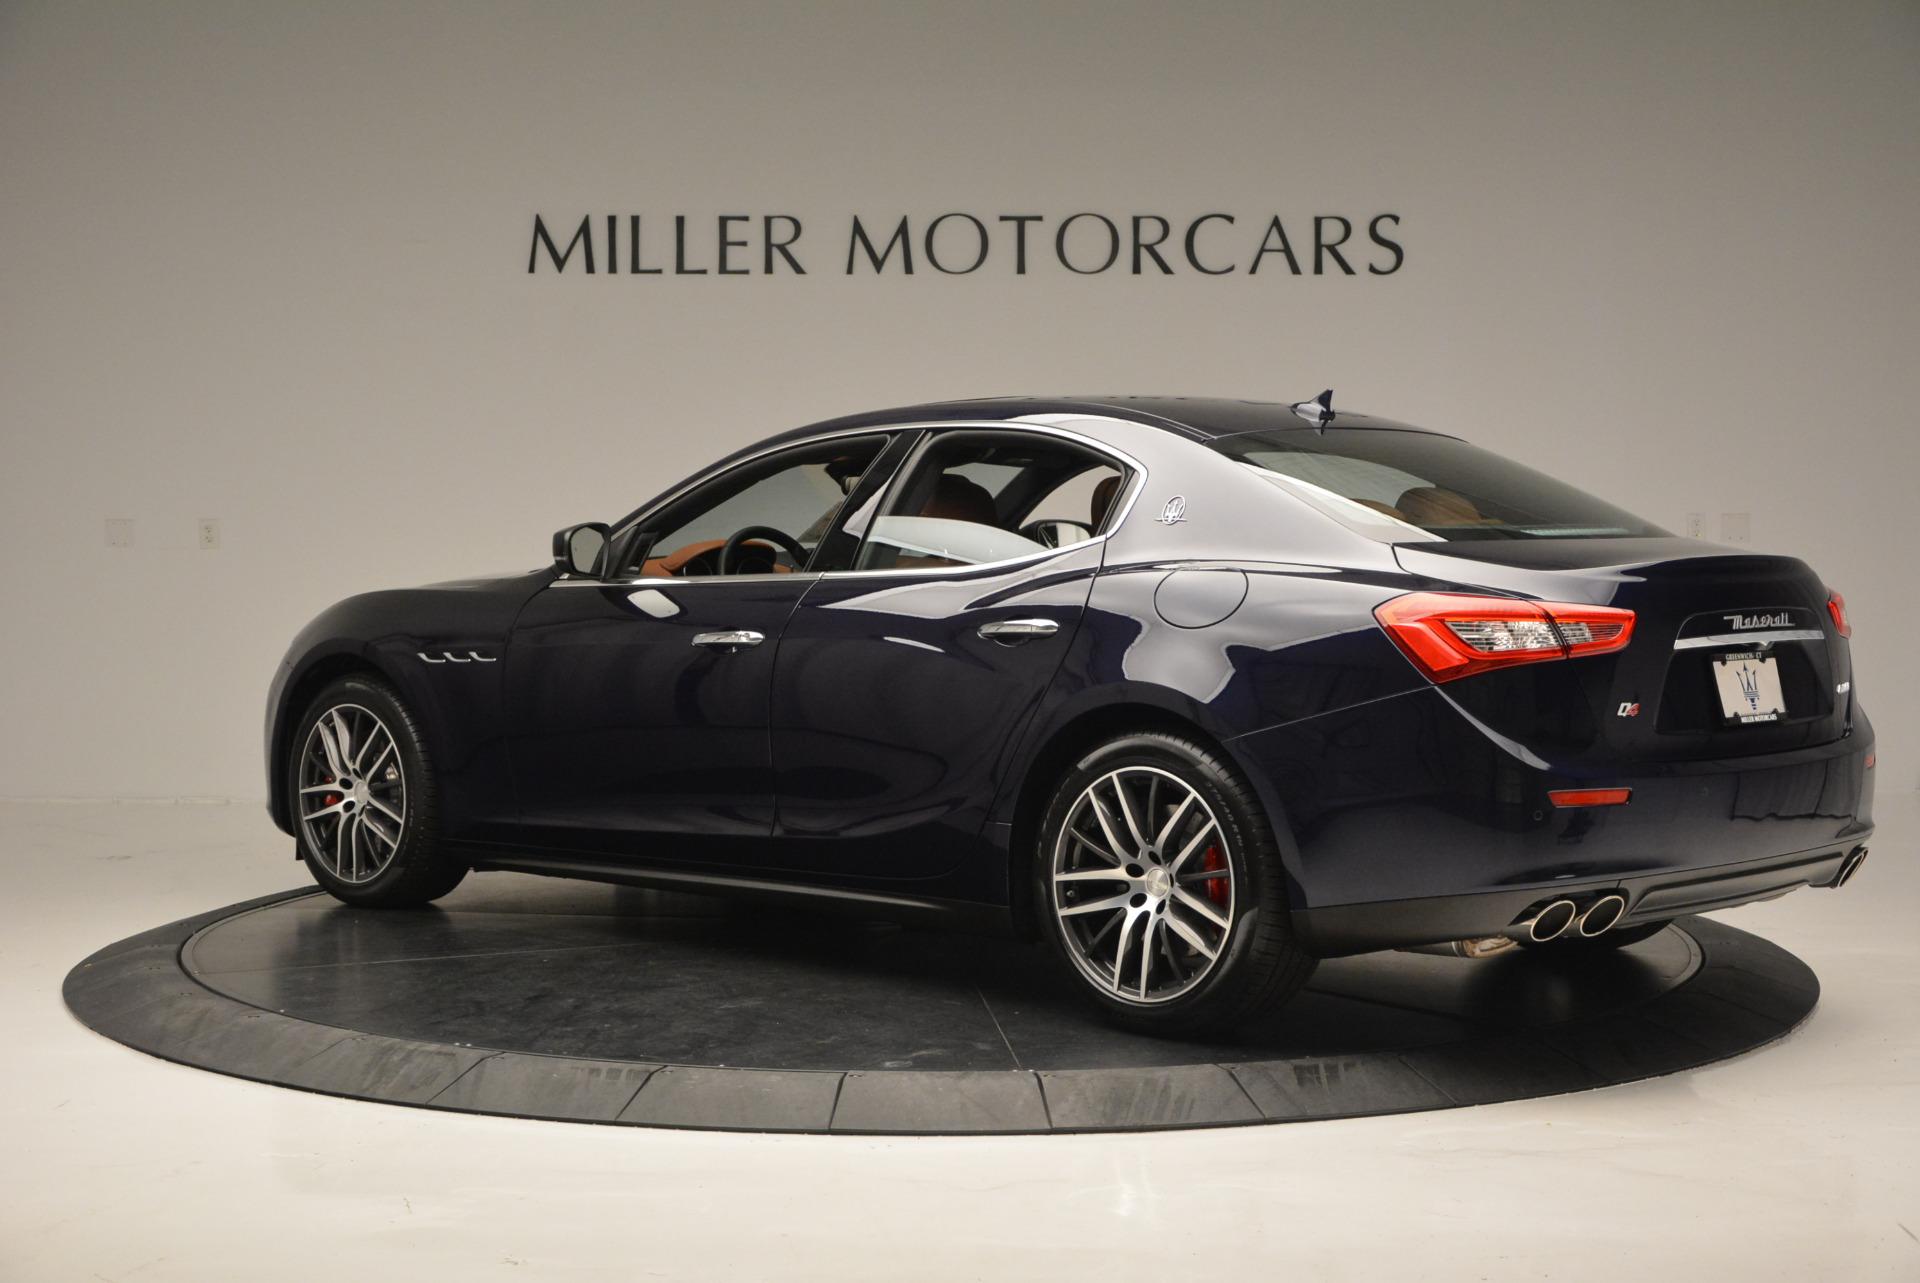 Used 2017 Maserati Ghibli S Q4 - EX Loaner For Sale In Greenwich, CT 567_p4